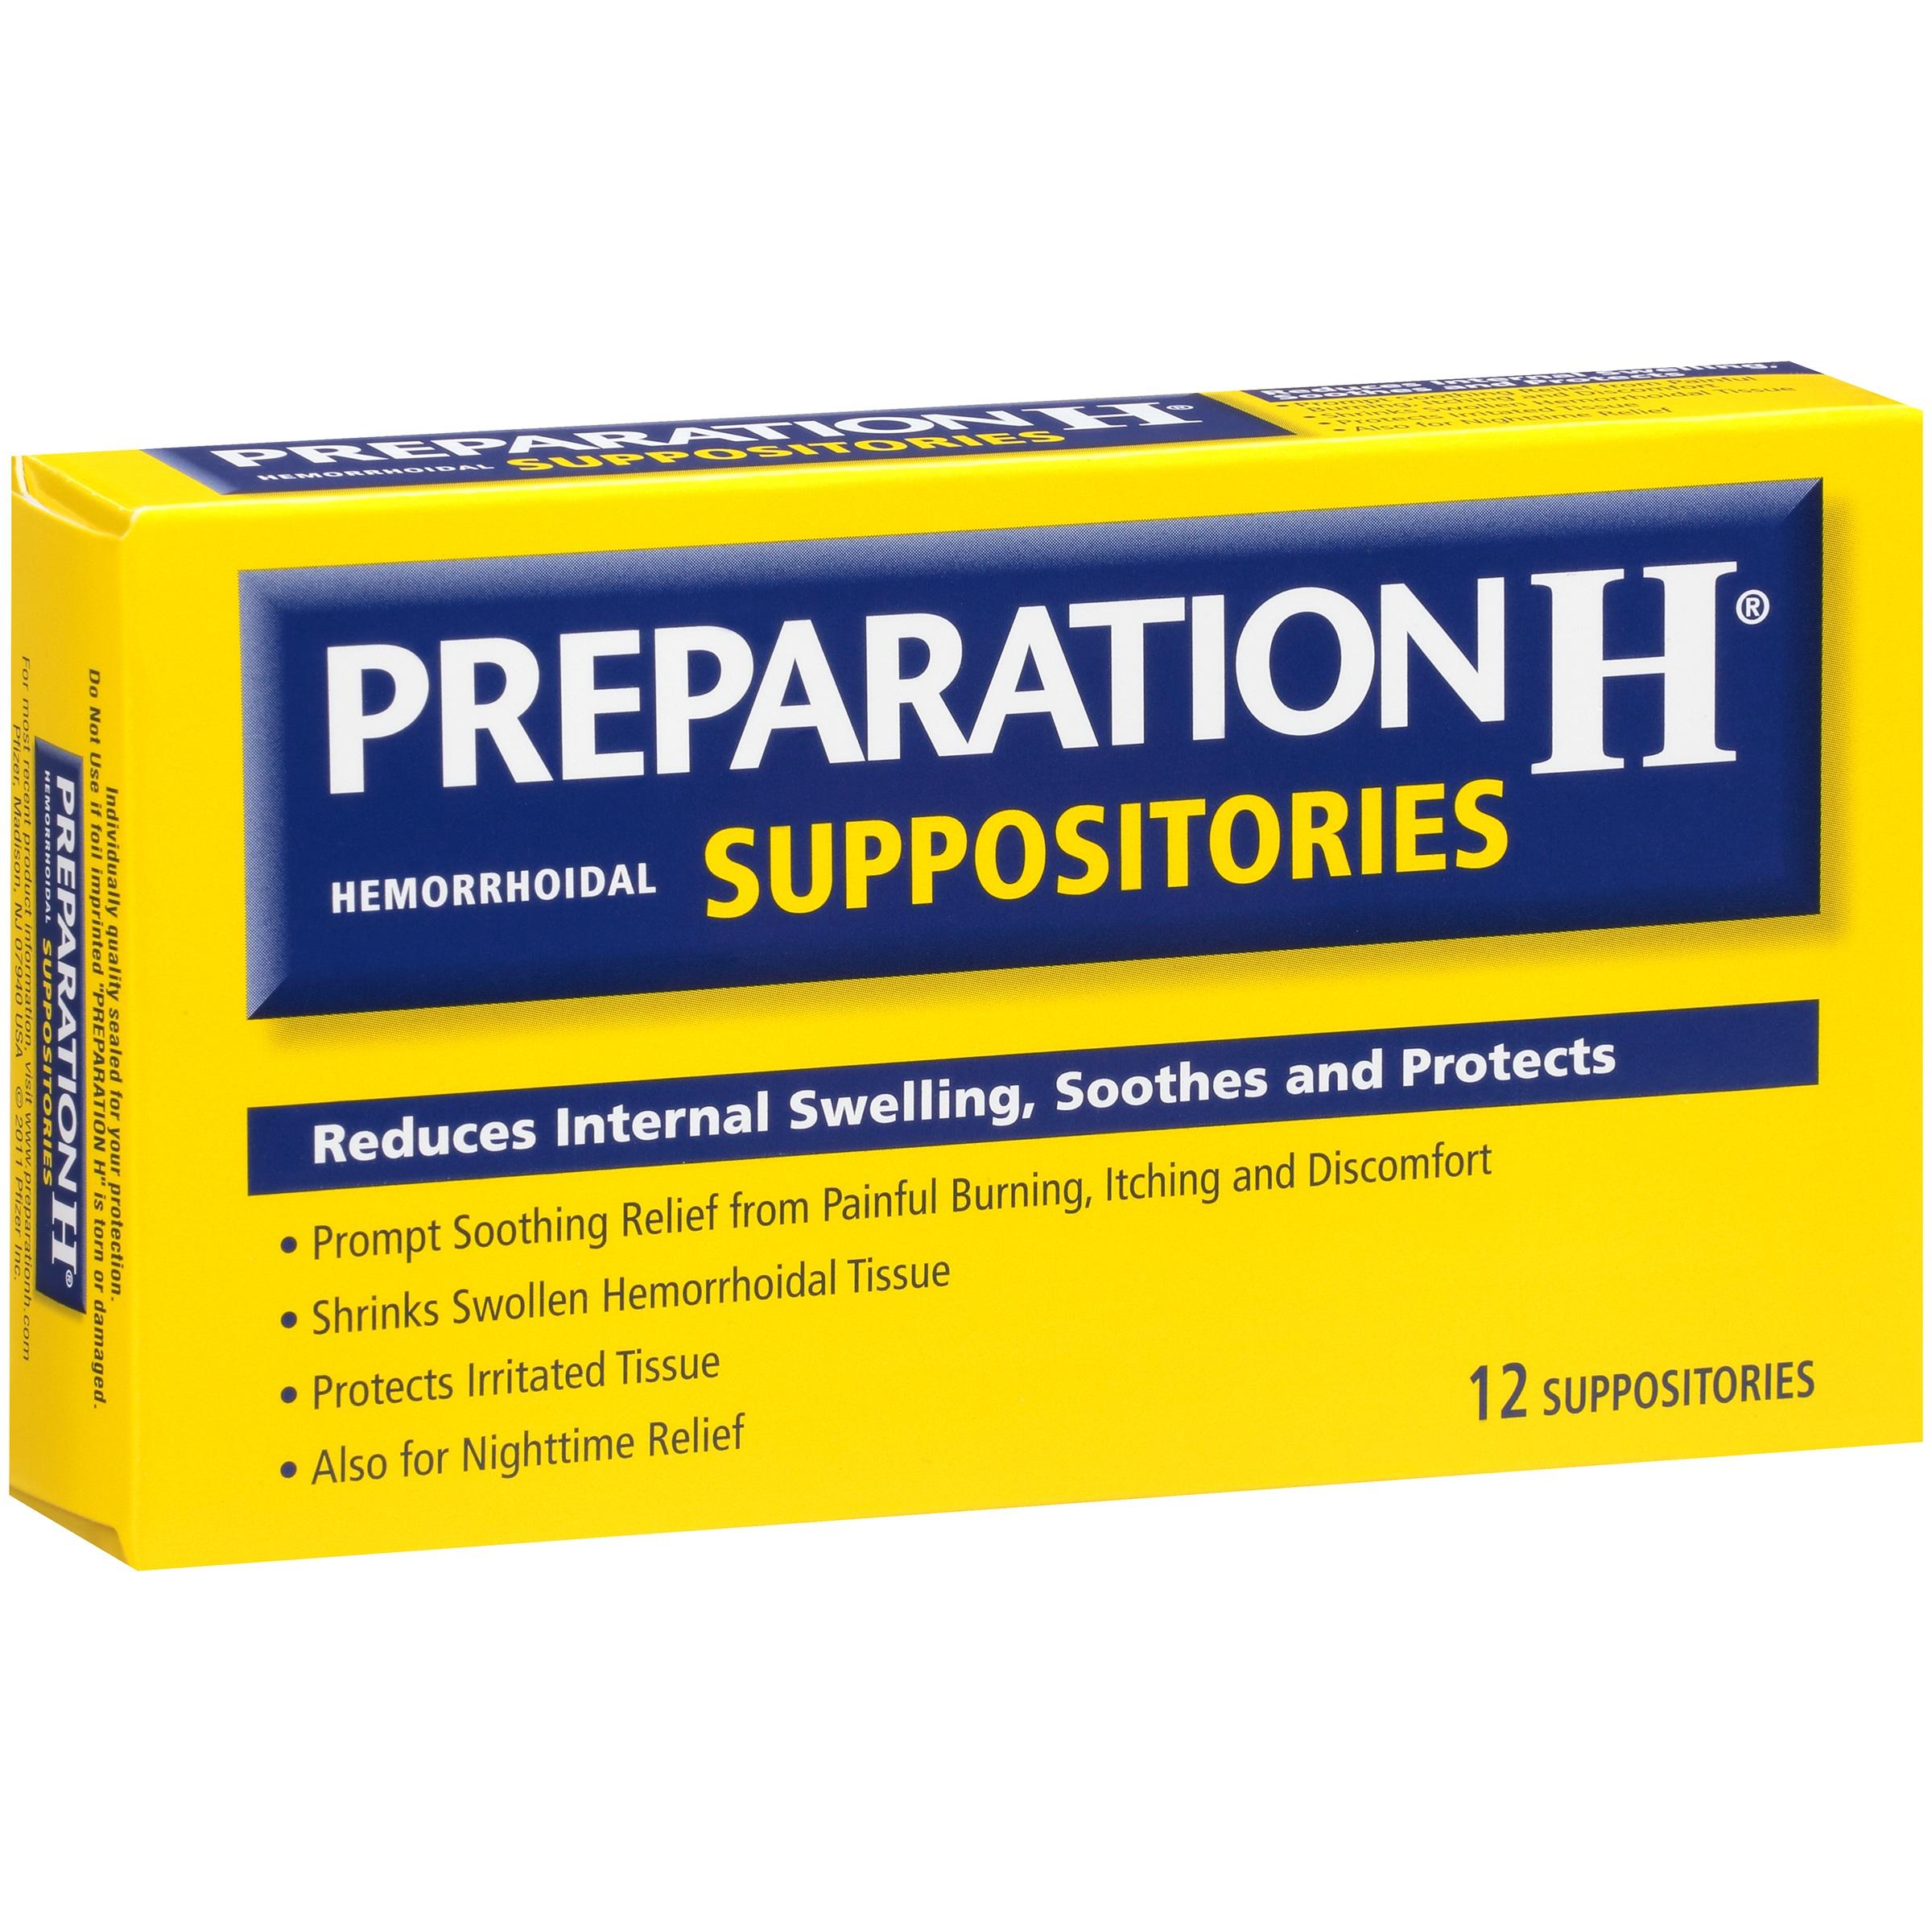 Preparation H® Hemorrhoidal Suppositories 12 ct Box